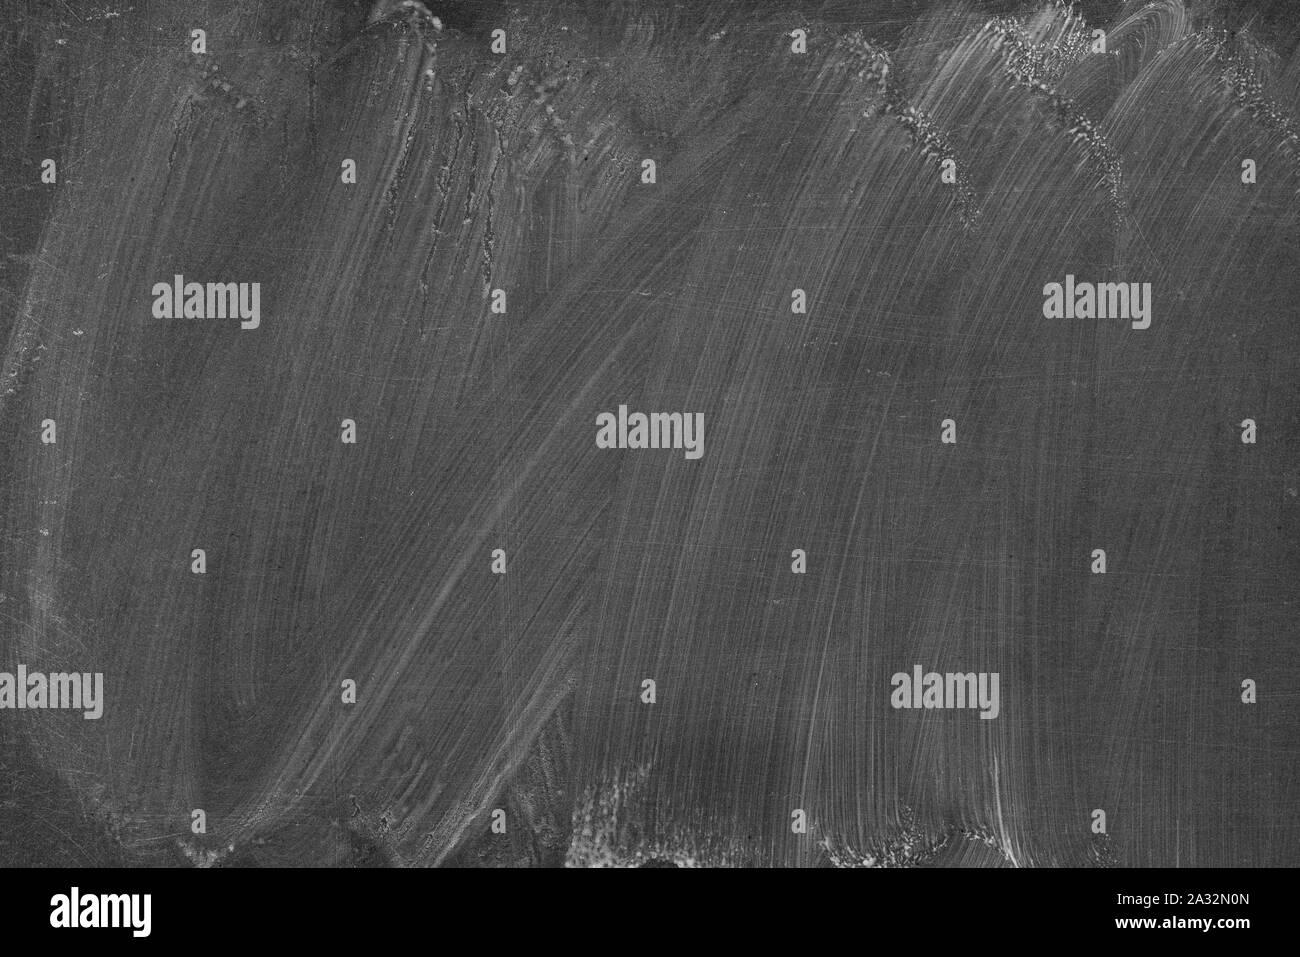 Old, dirty blackboard or chalkboard Stock Photo